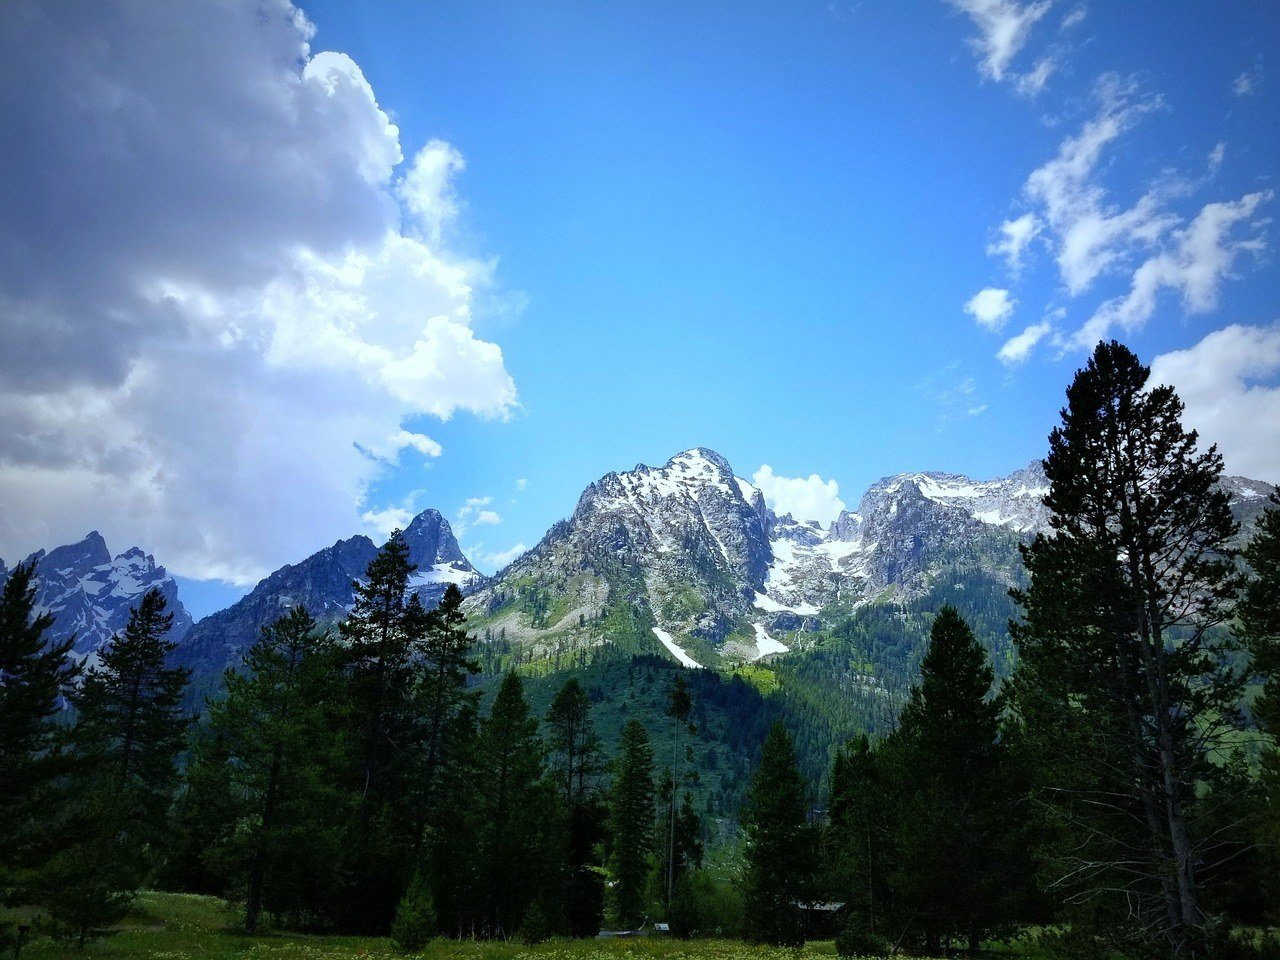 Driggs, Grand Teton National Park